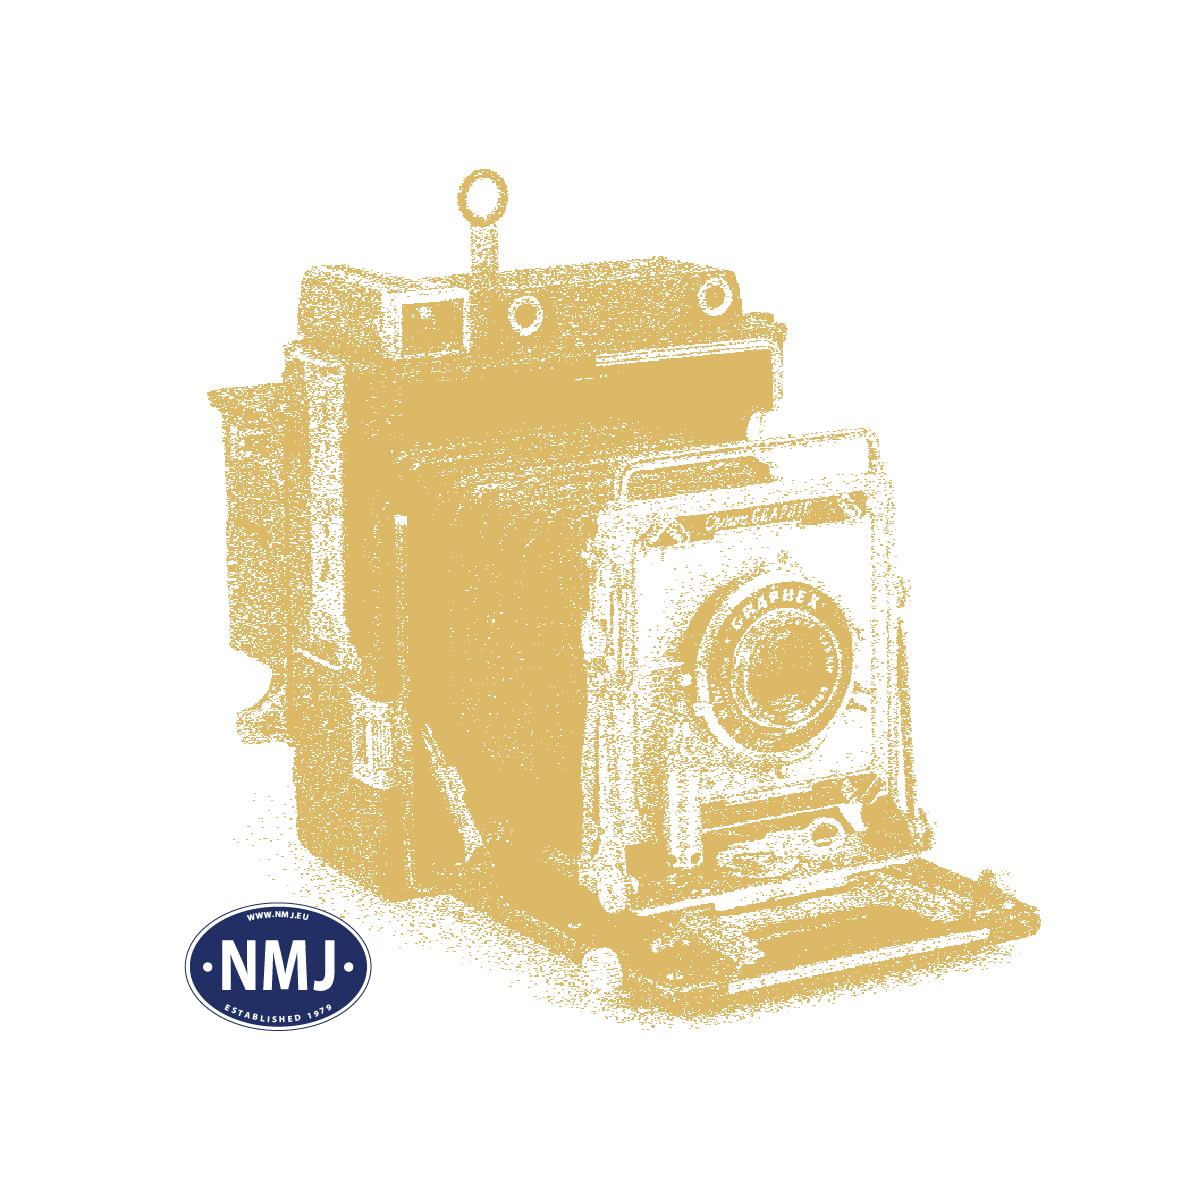 NMJE89905 - NMJ Display Case 0-Gauge, 60 Cm (640 x 200 mm)